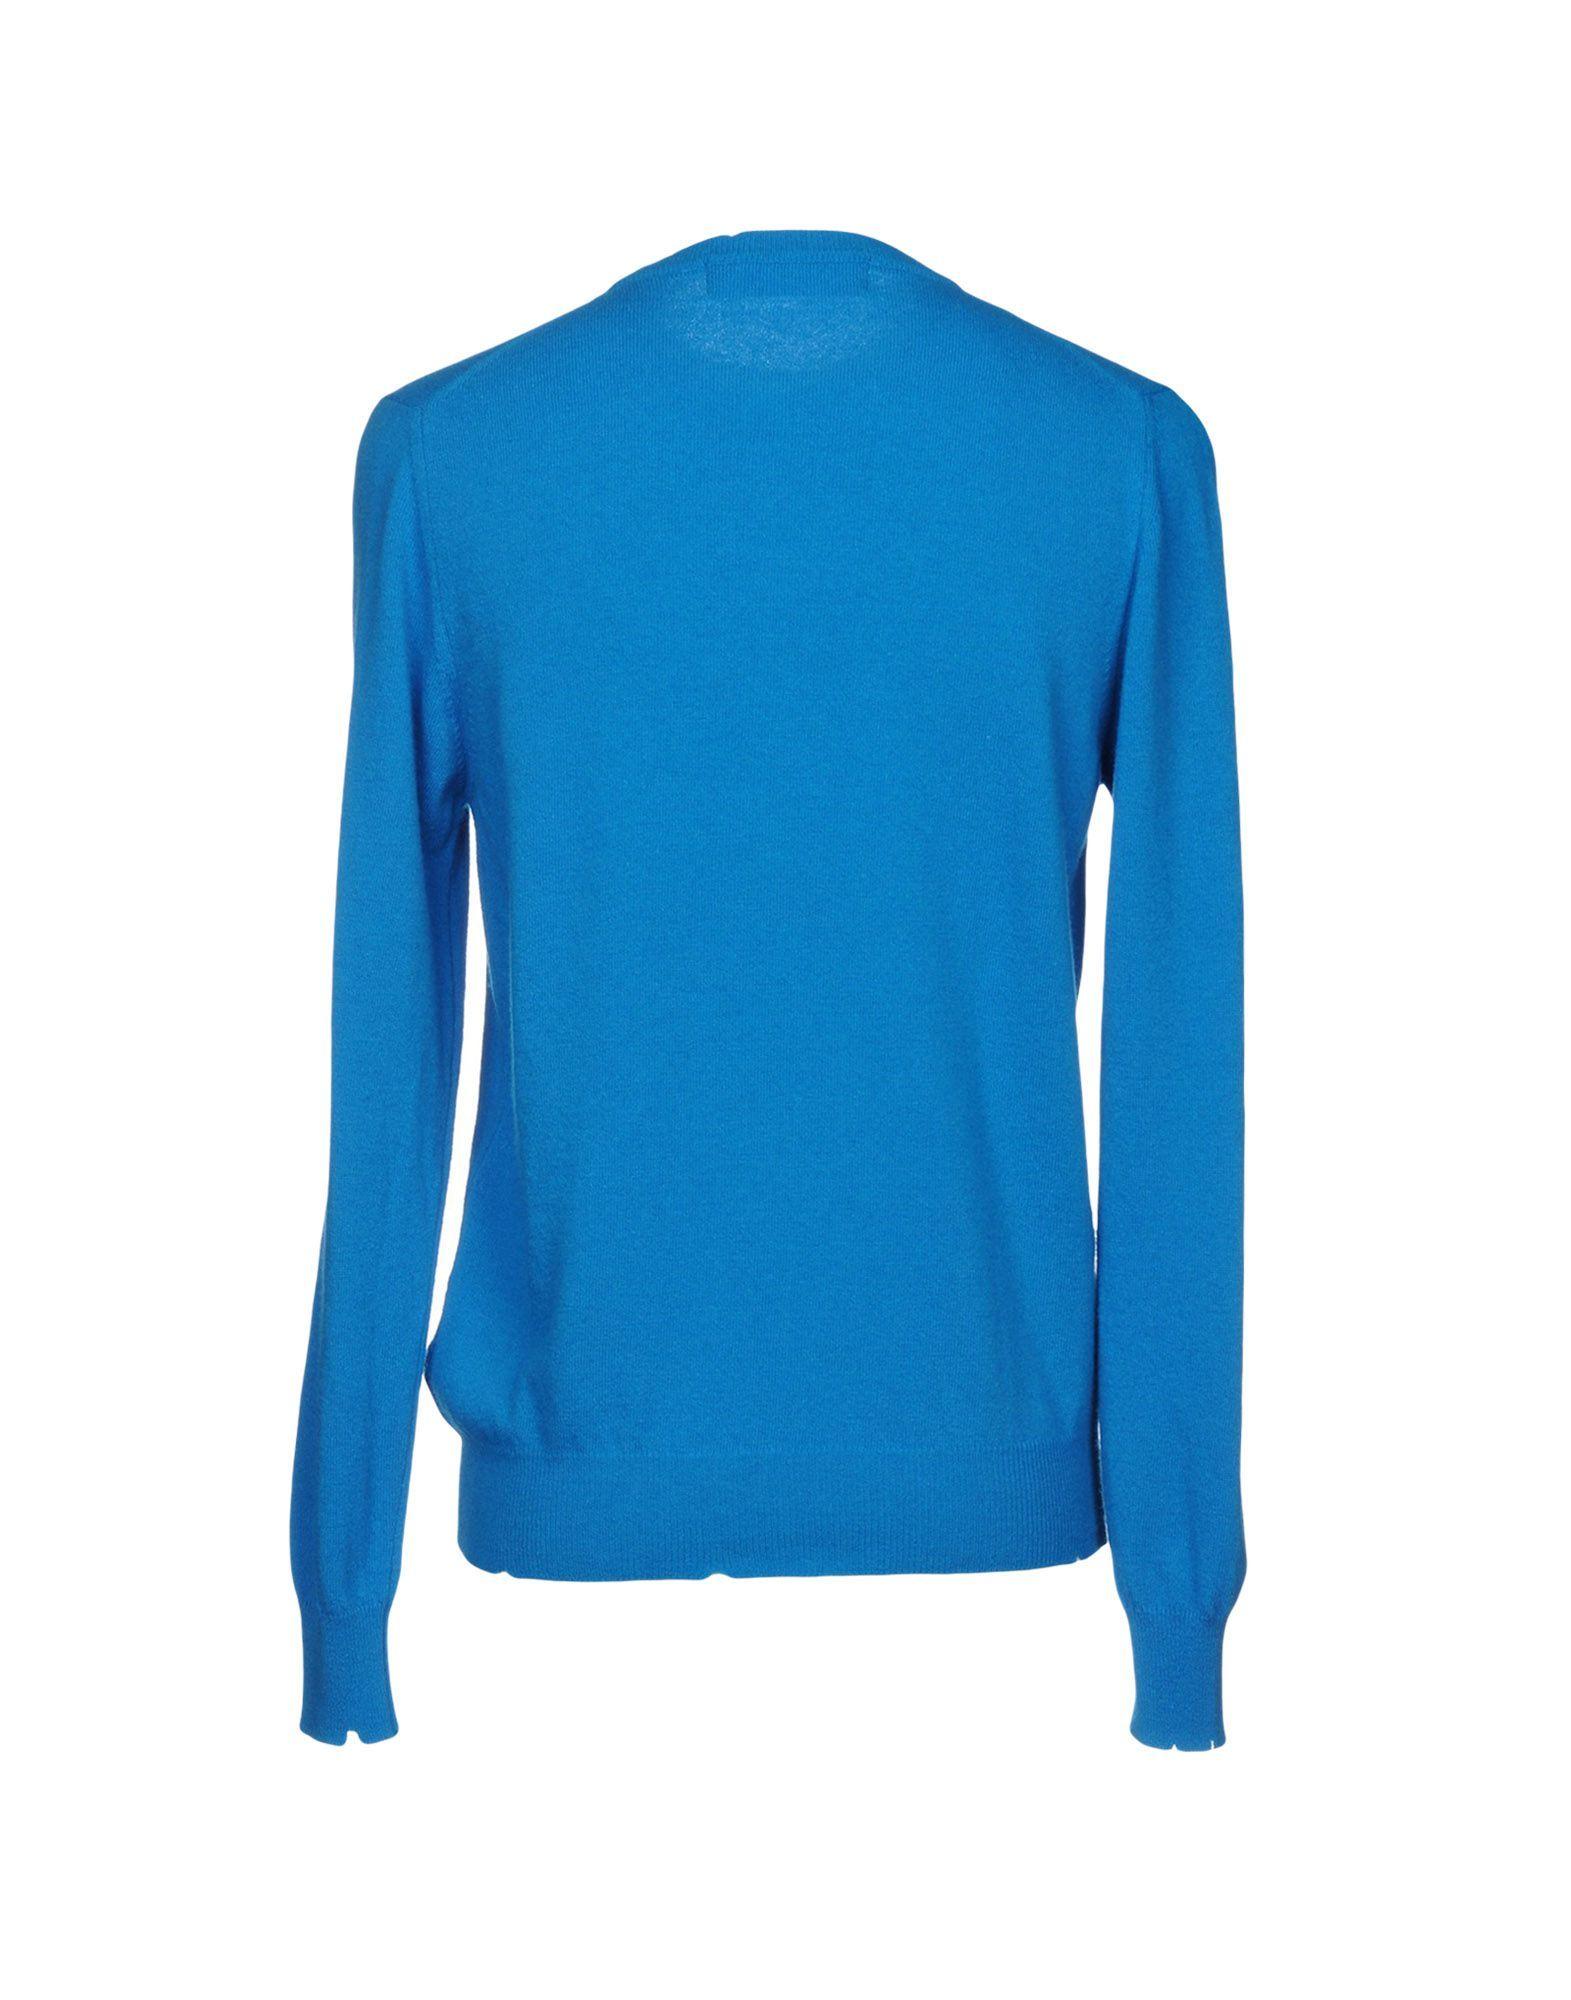 KNITWEAR Department 5 Azure Man Wool